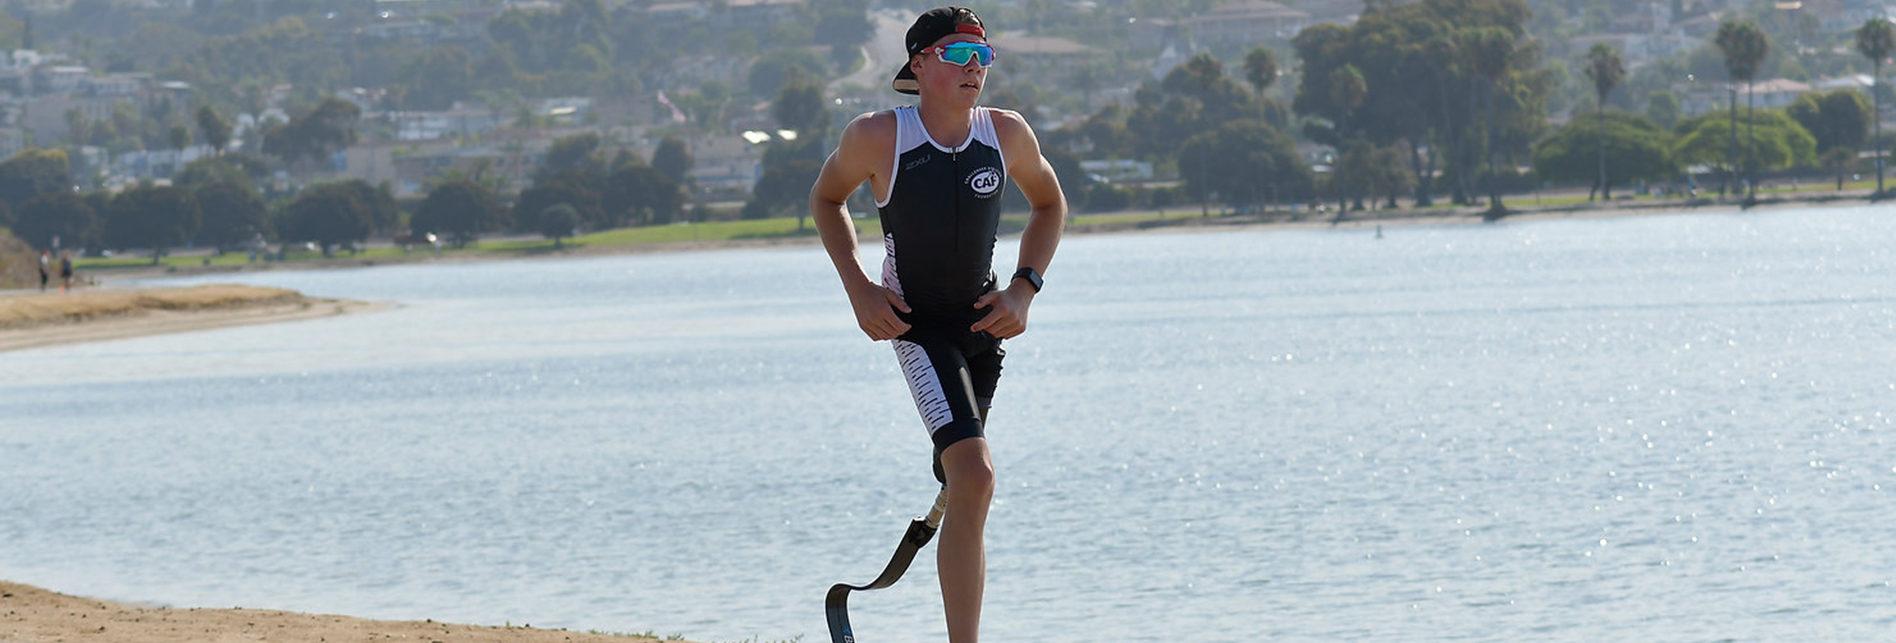 Elite Sports- Jack Paratriathlon feature image